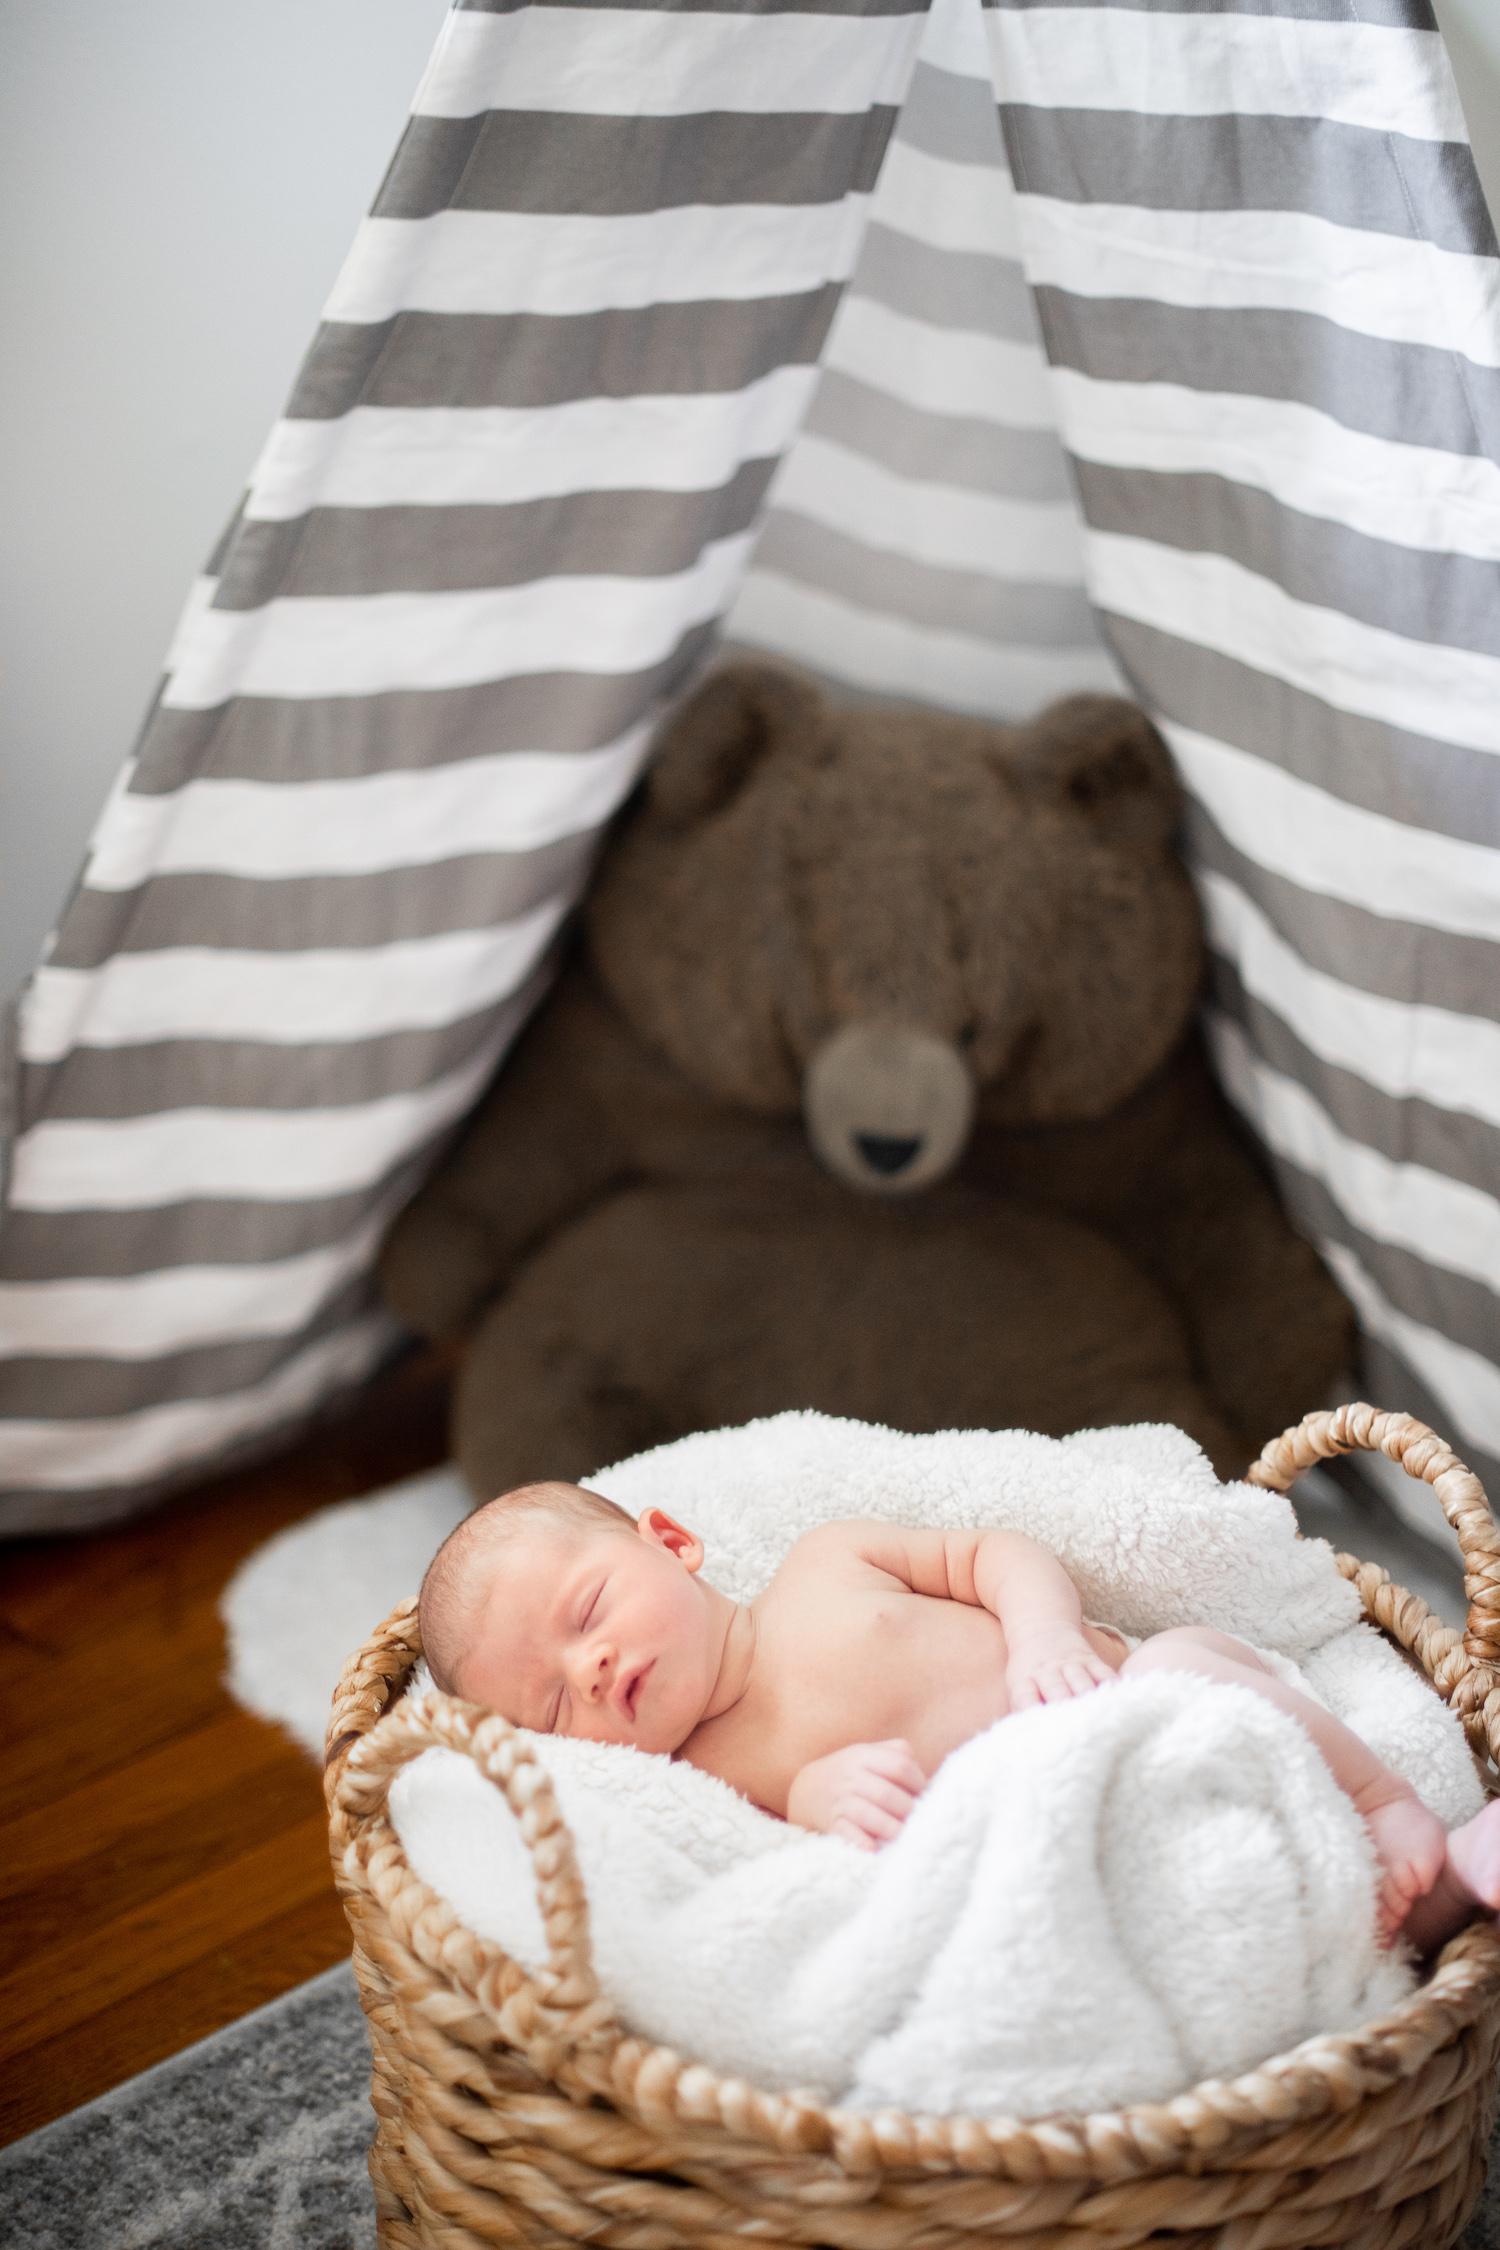 atlanta-chamblee-newborn-photographer-lifestyle-angela-elliott-wingard-35.jpg